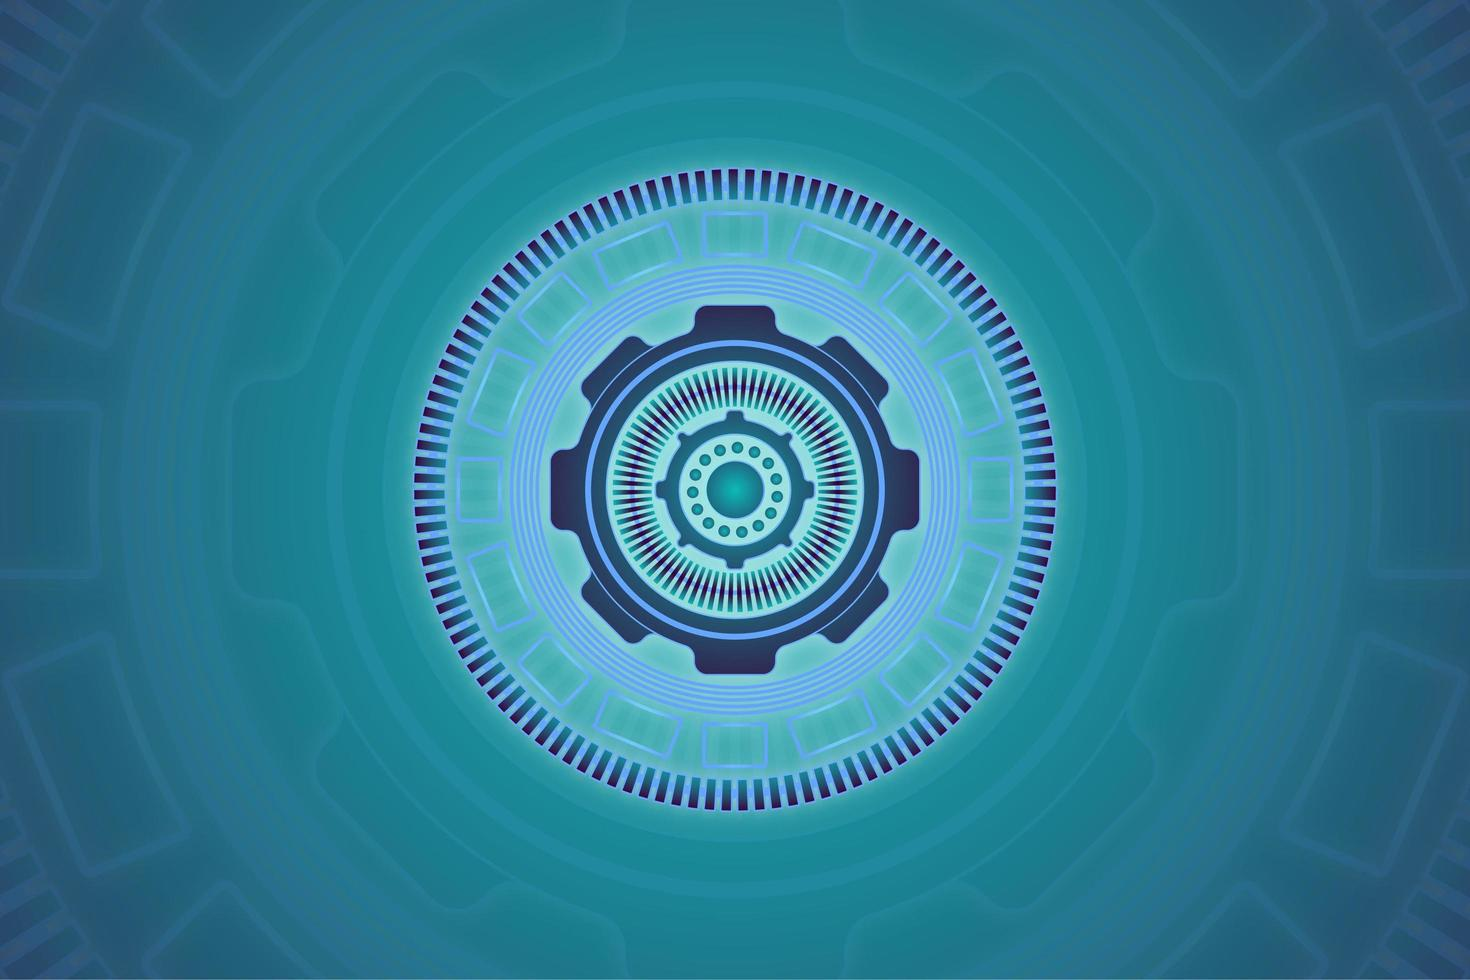 abstract blauw cirkel technologieontwerp vector